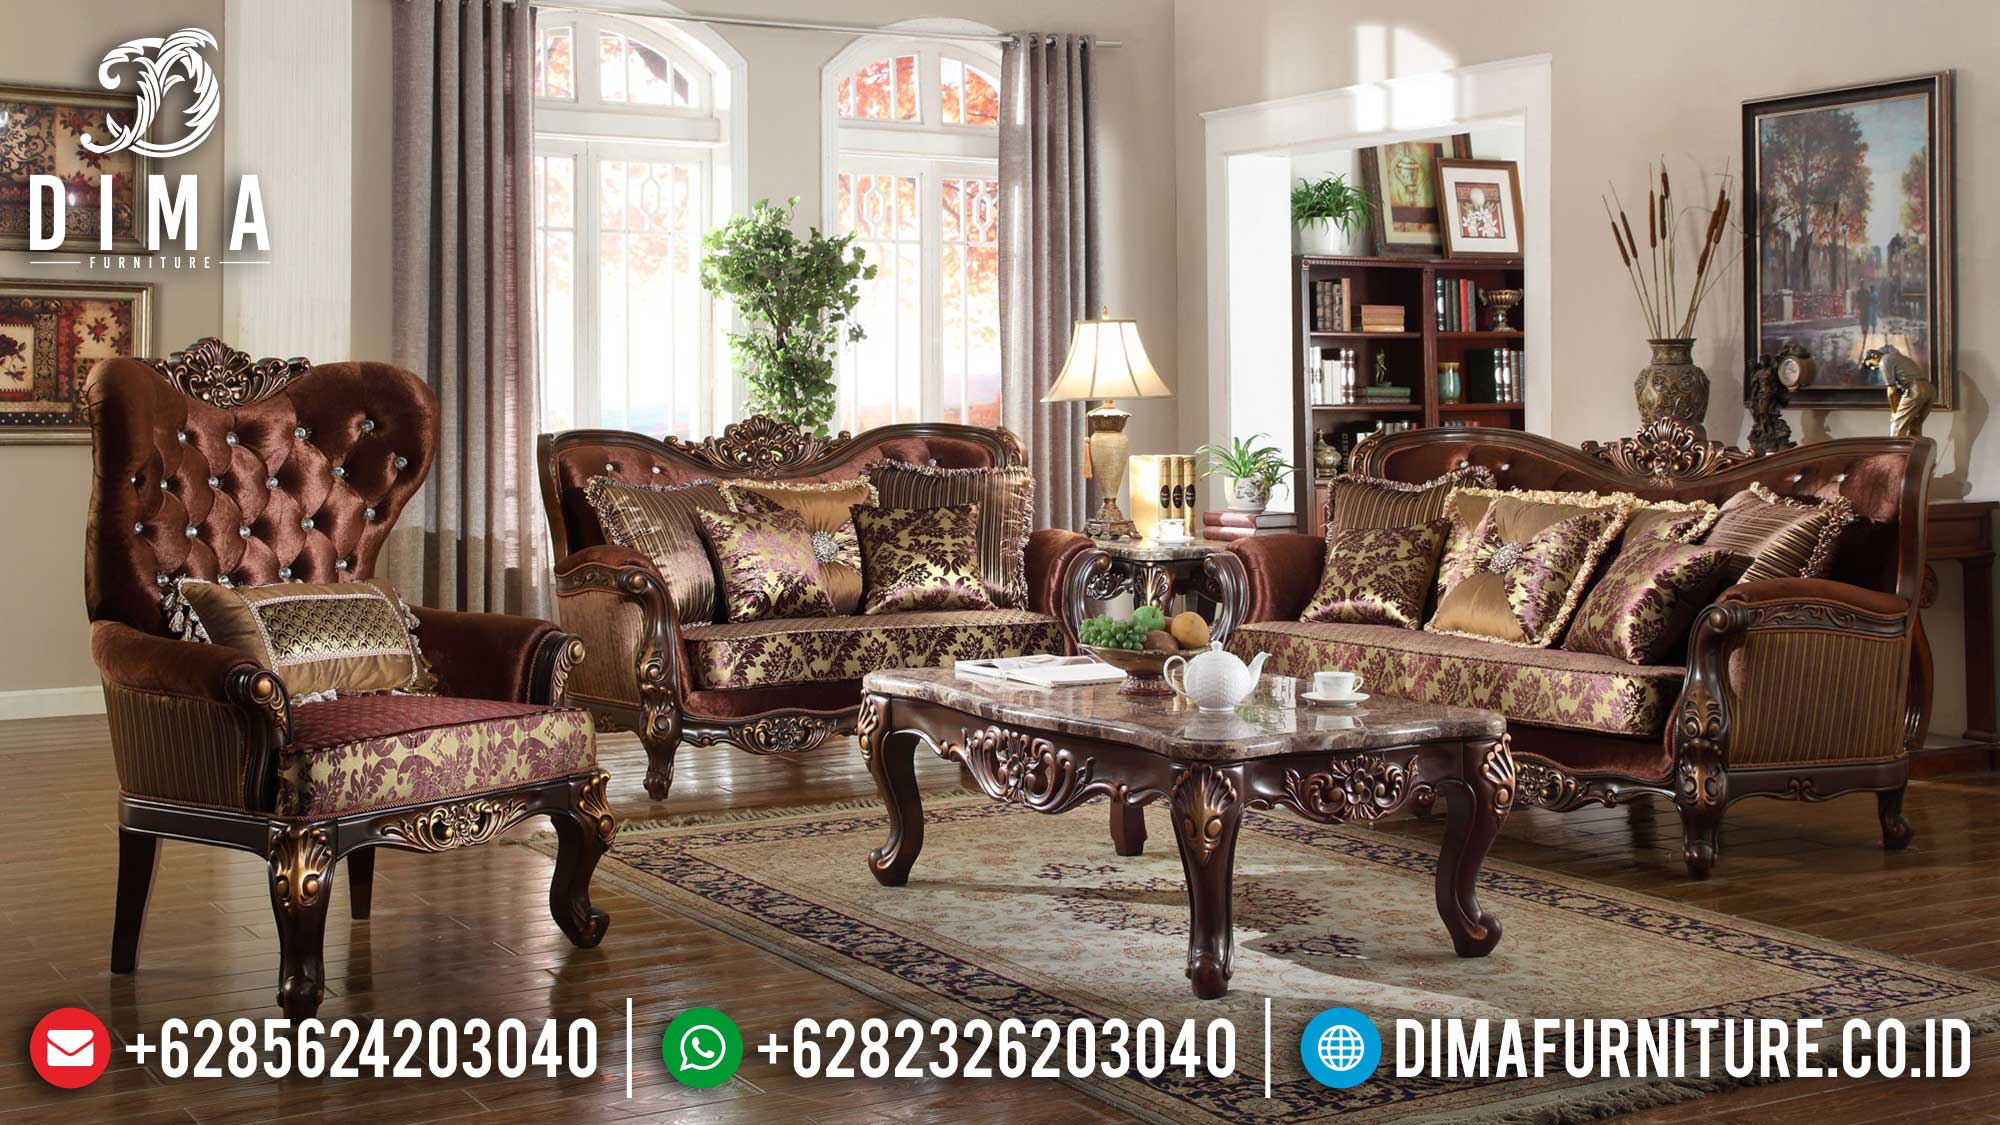 Majestic Concept Sofa Tamu Mewah Ukiran Jepara Luxury Classic Design Ttj-1527